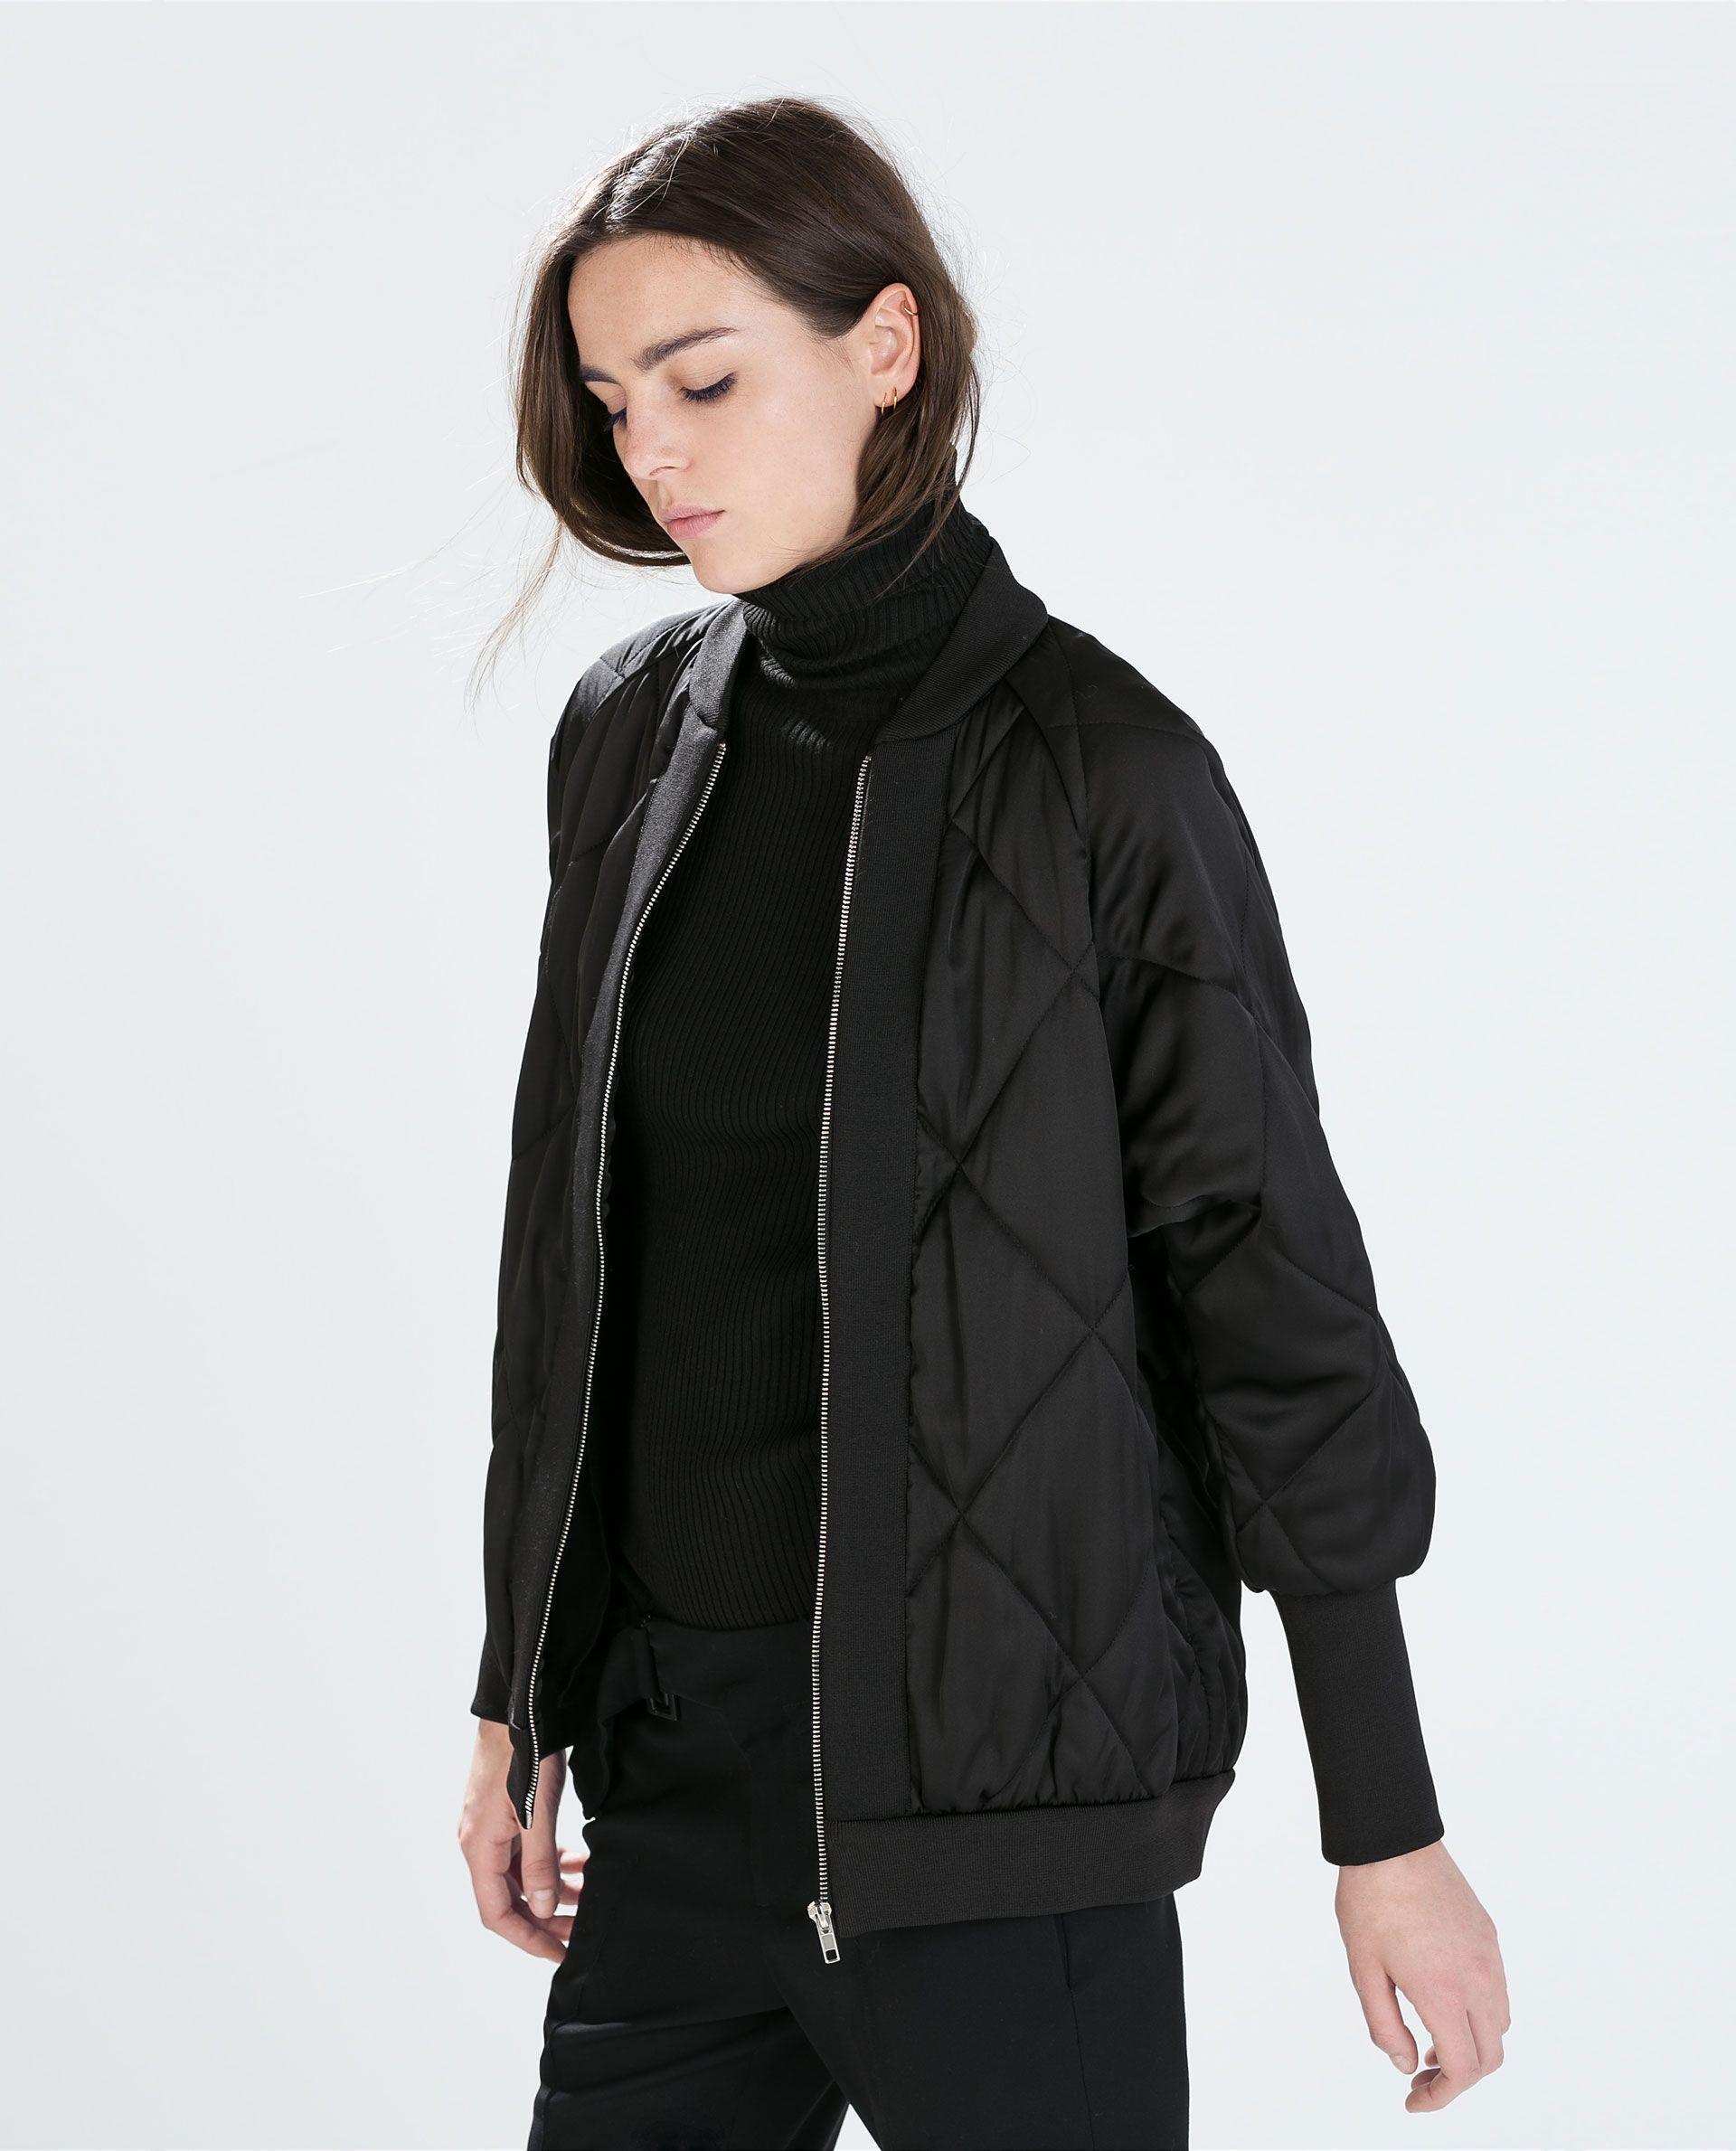 Zara oversize jacke damen